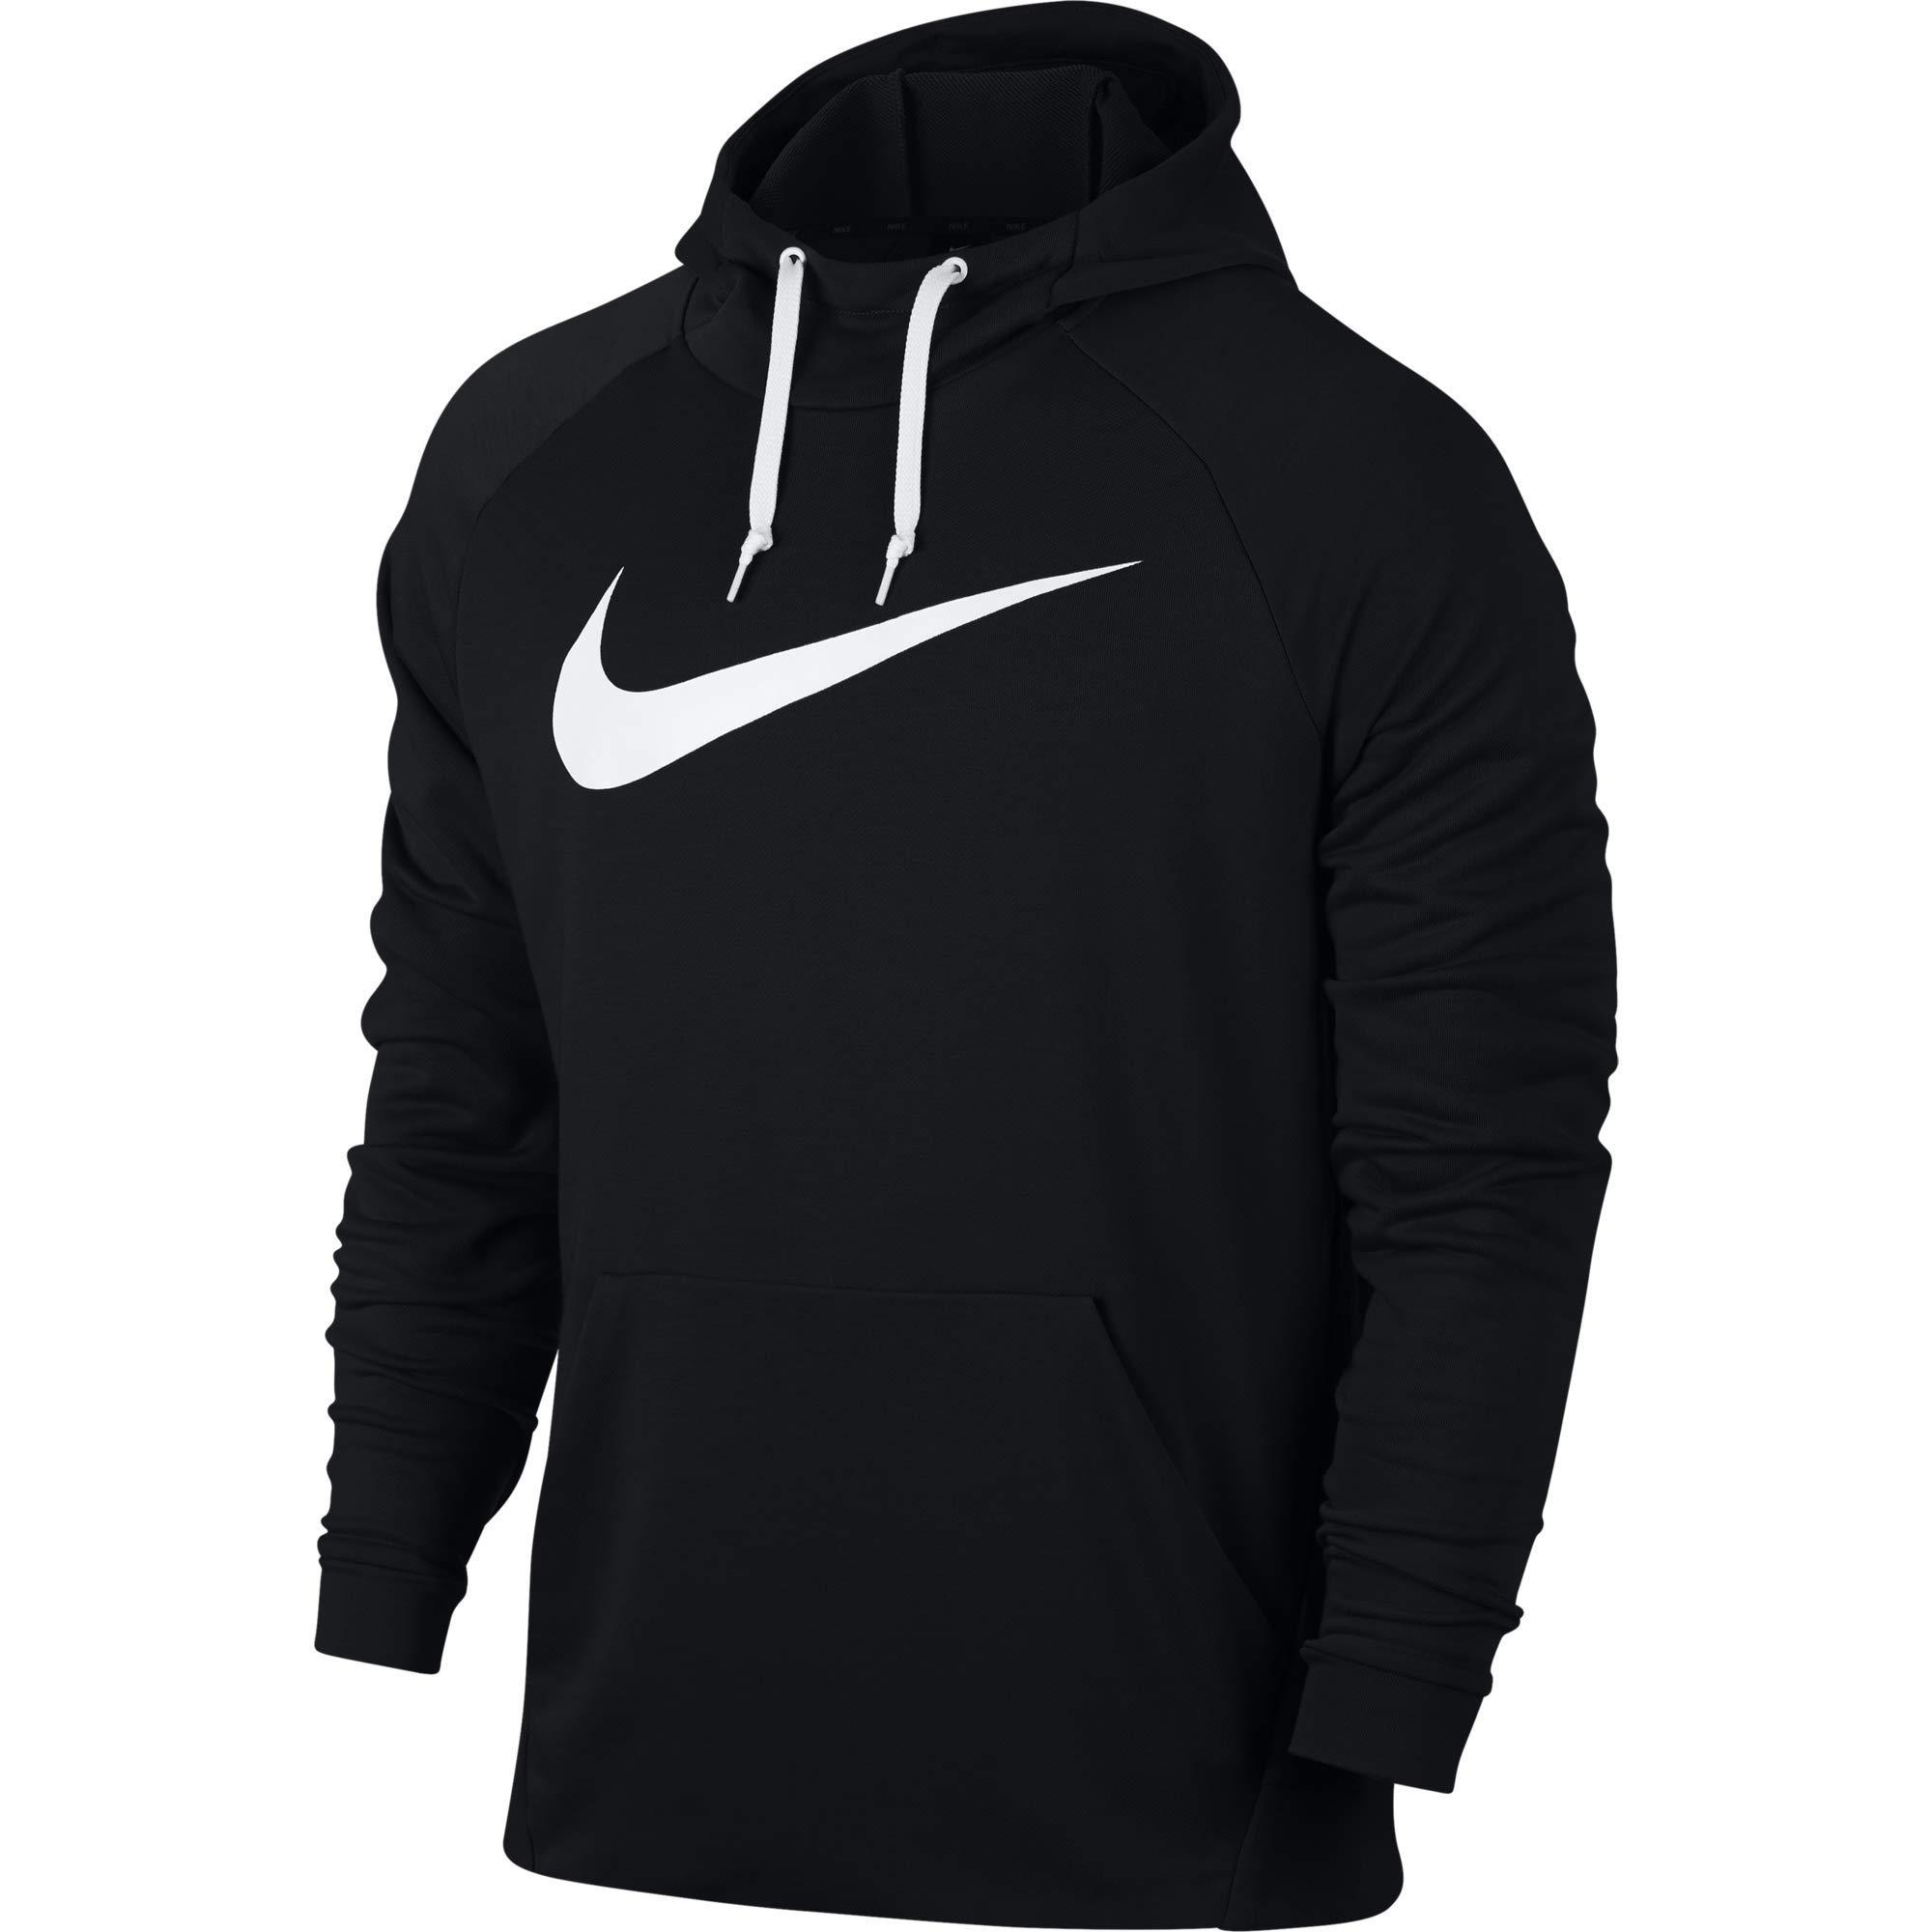 Nike 885818 010, Felpa Uomo, BlackWhite, M